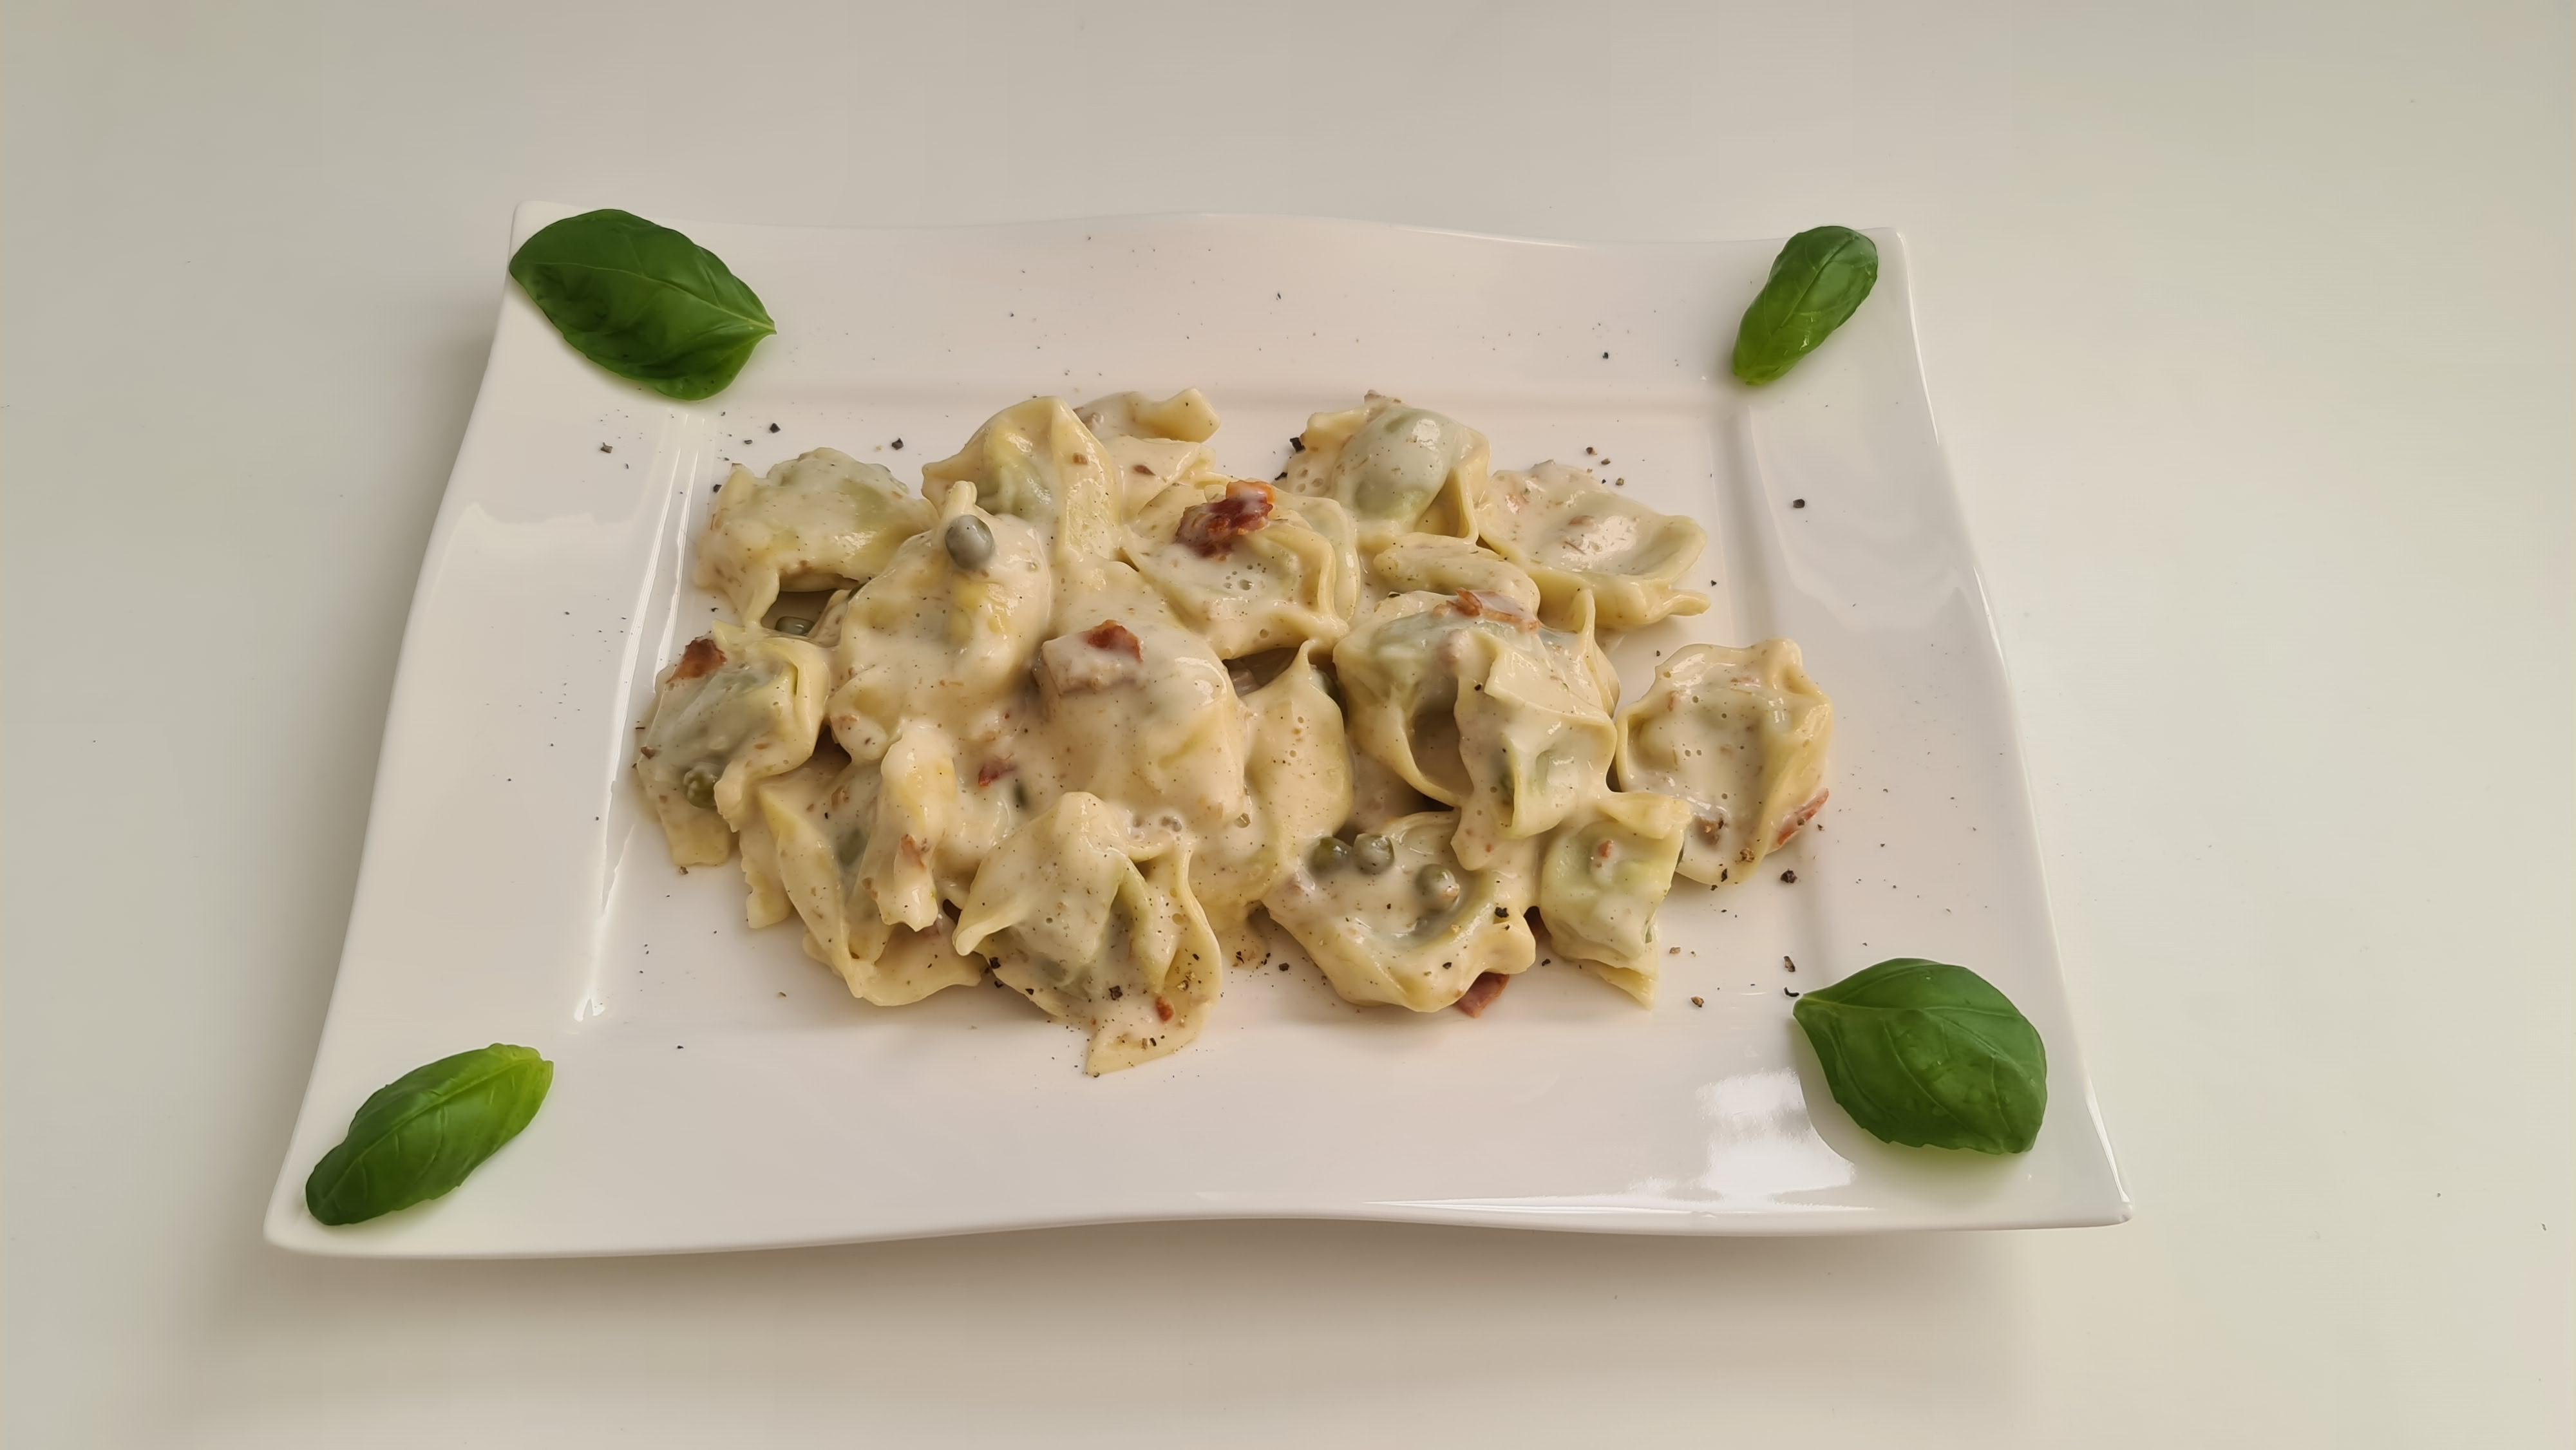 https://foodloader.net/Holz_2020-05-05_Tortelloni_Carbonara.jpg